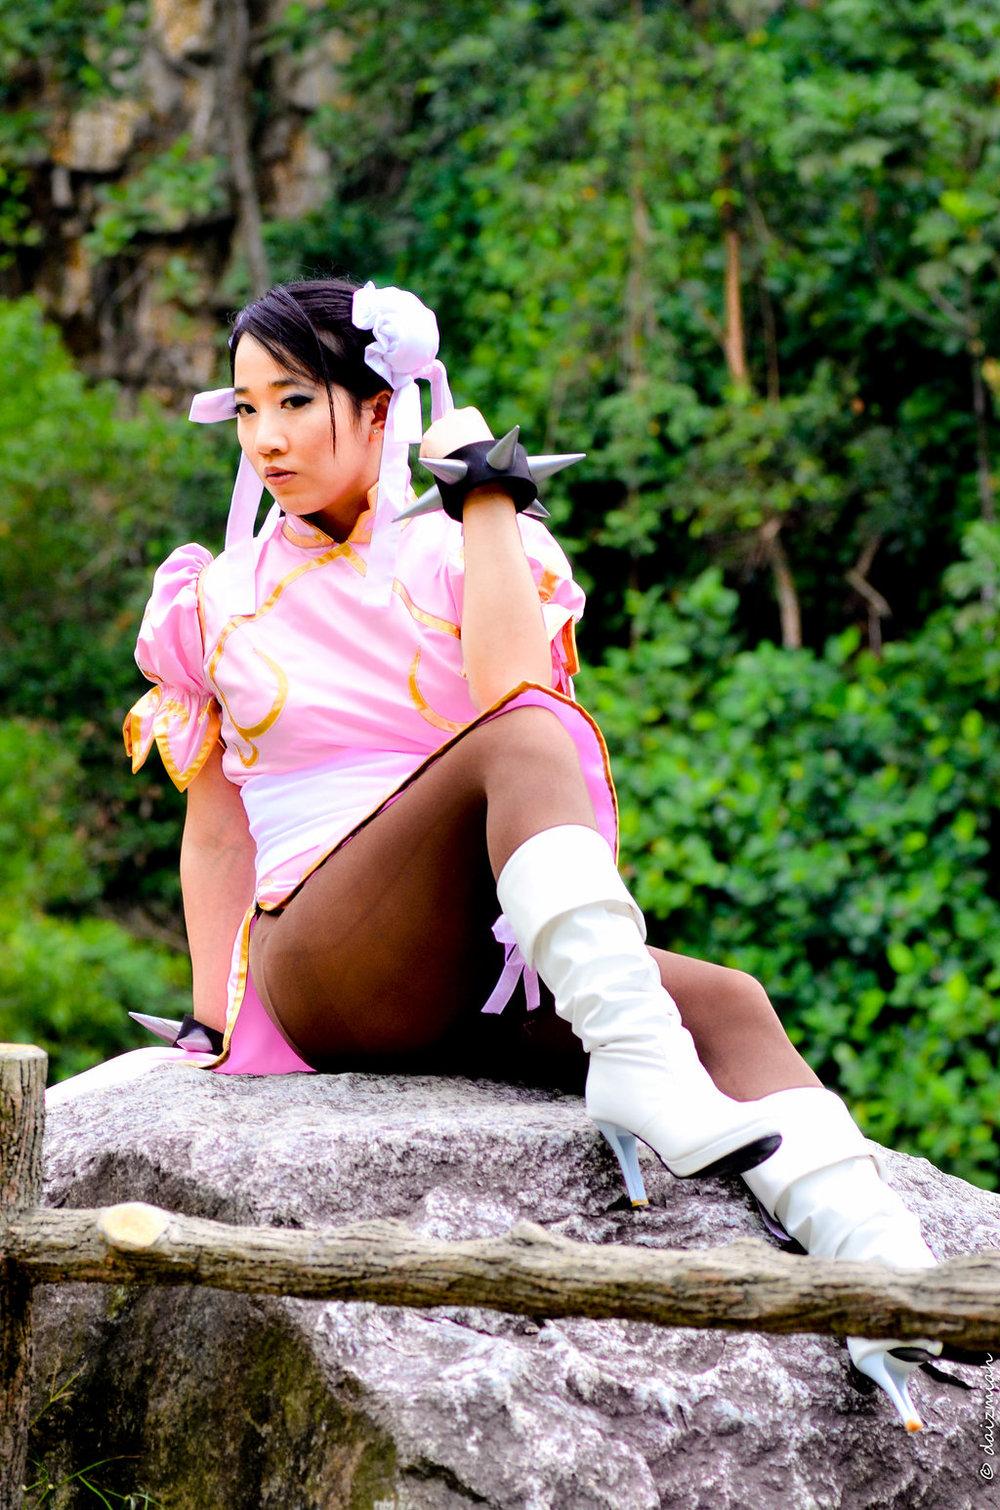 Yukiko Miaka is Chun-Li | Photo by: Jeremiah Pantino